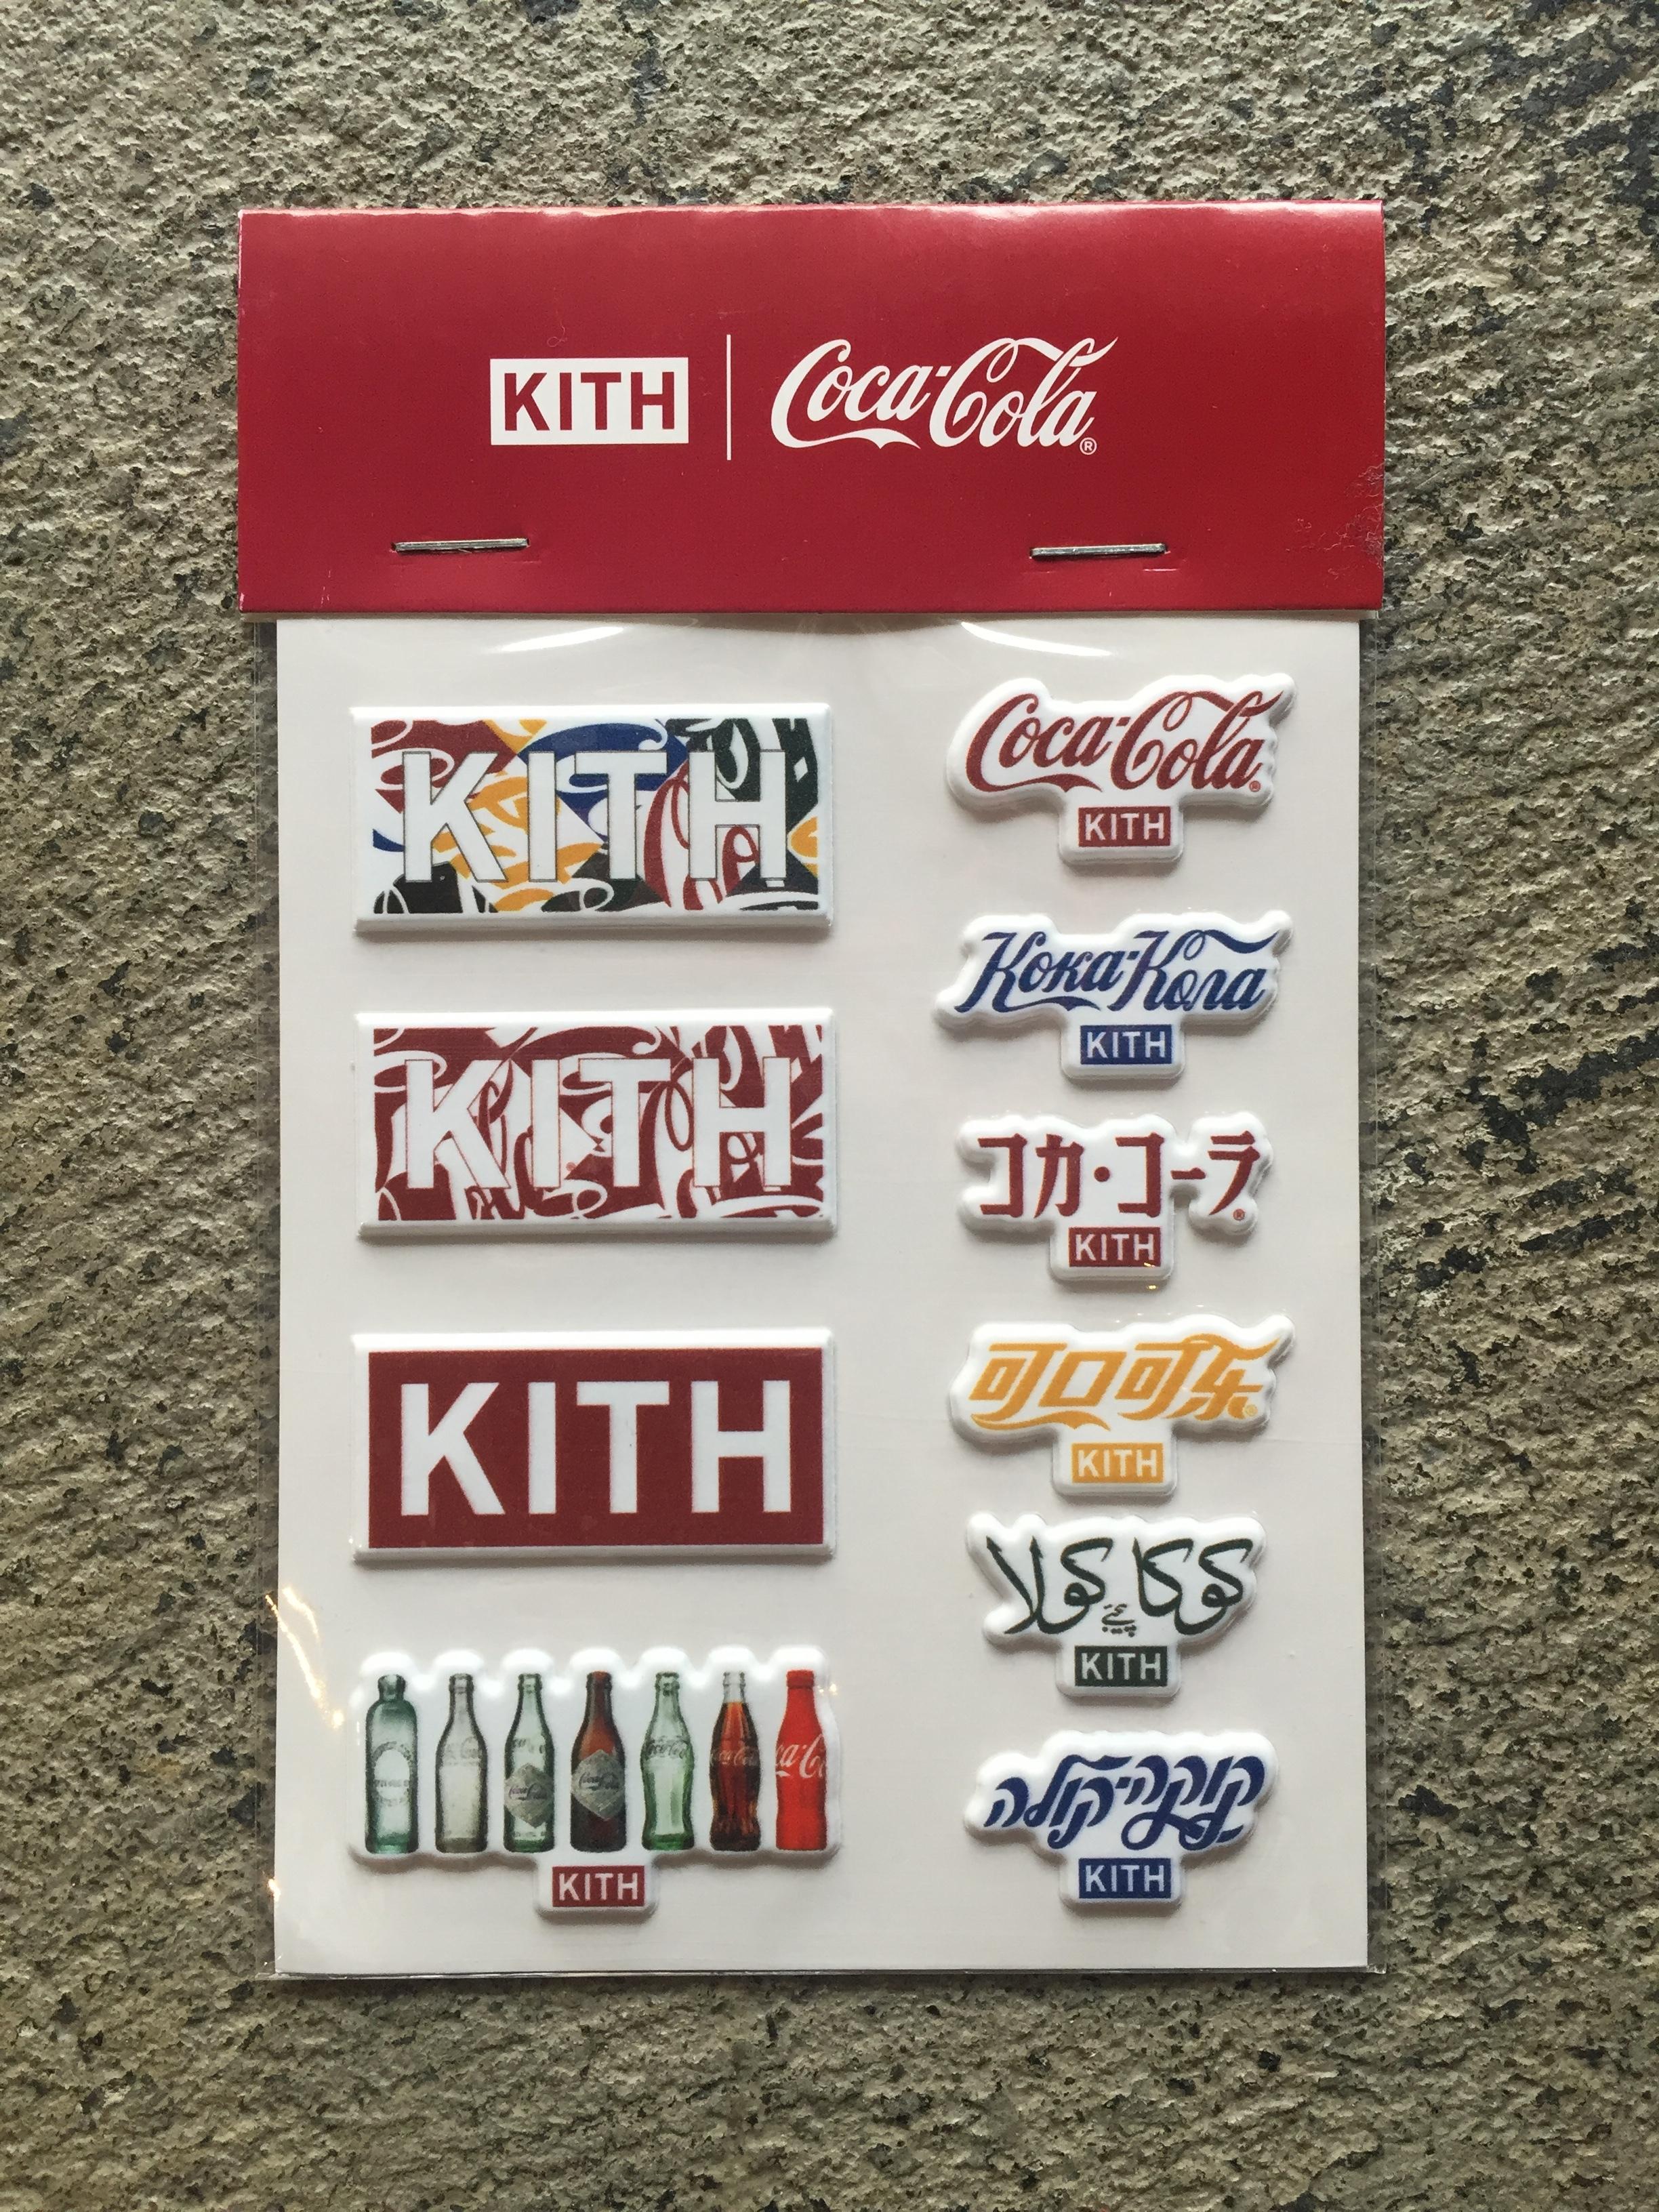 Kith x Coca Cola Sticker Pack